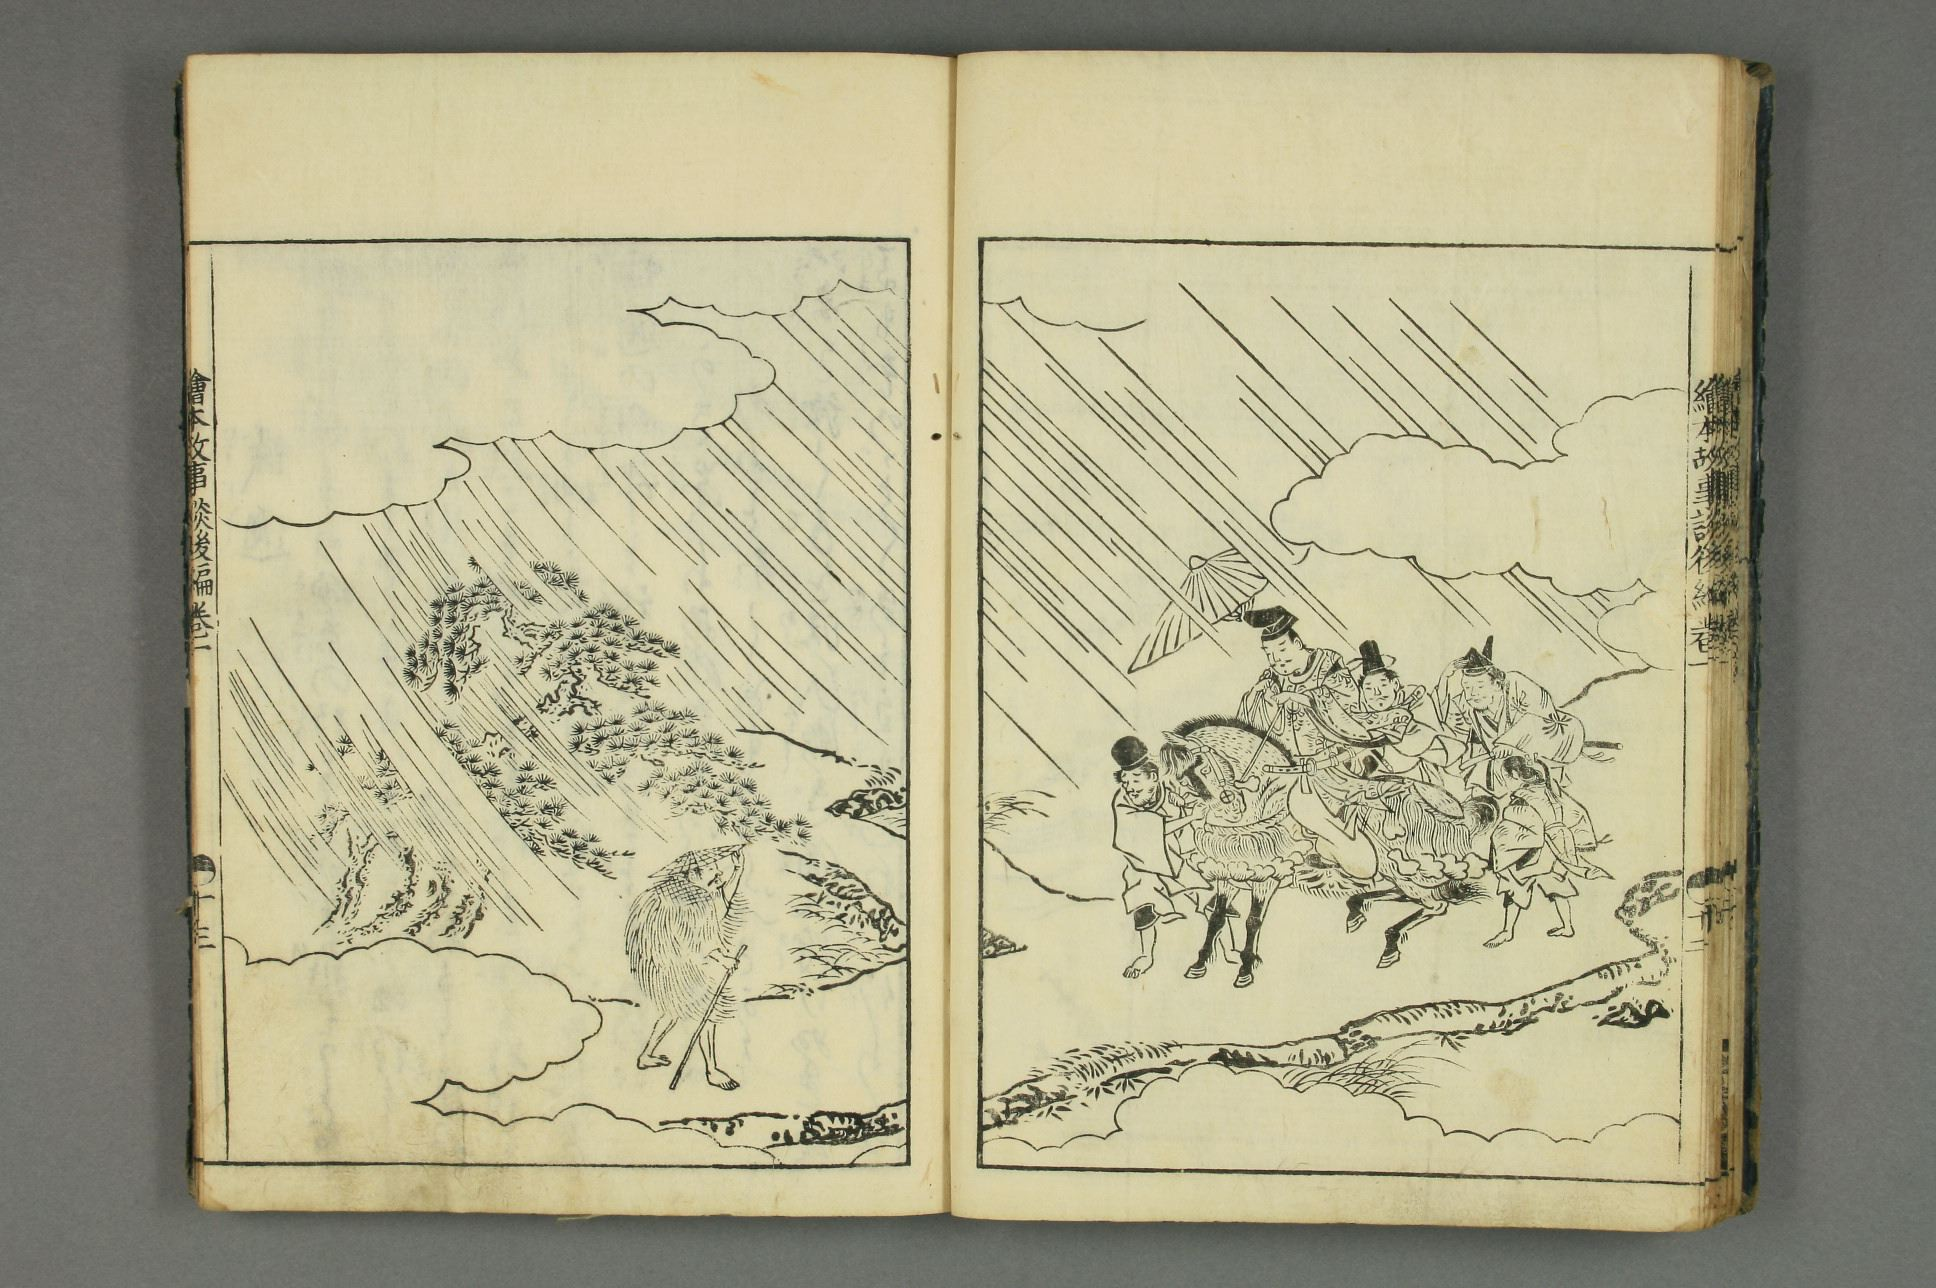 http://archive.wul.waseda.ac.jp/kosho/bunko08/bunko08_d0255/bunko08_d0255_0001/bunko08_d0255_0001_p0017.jpg